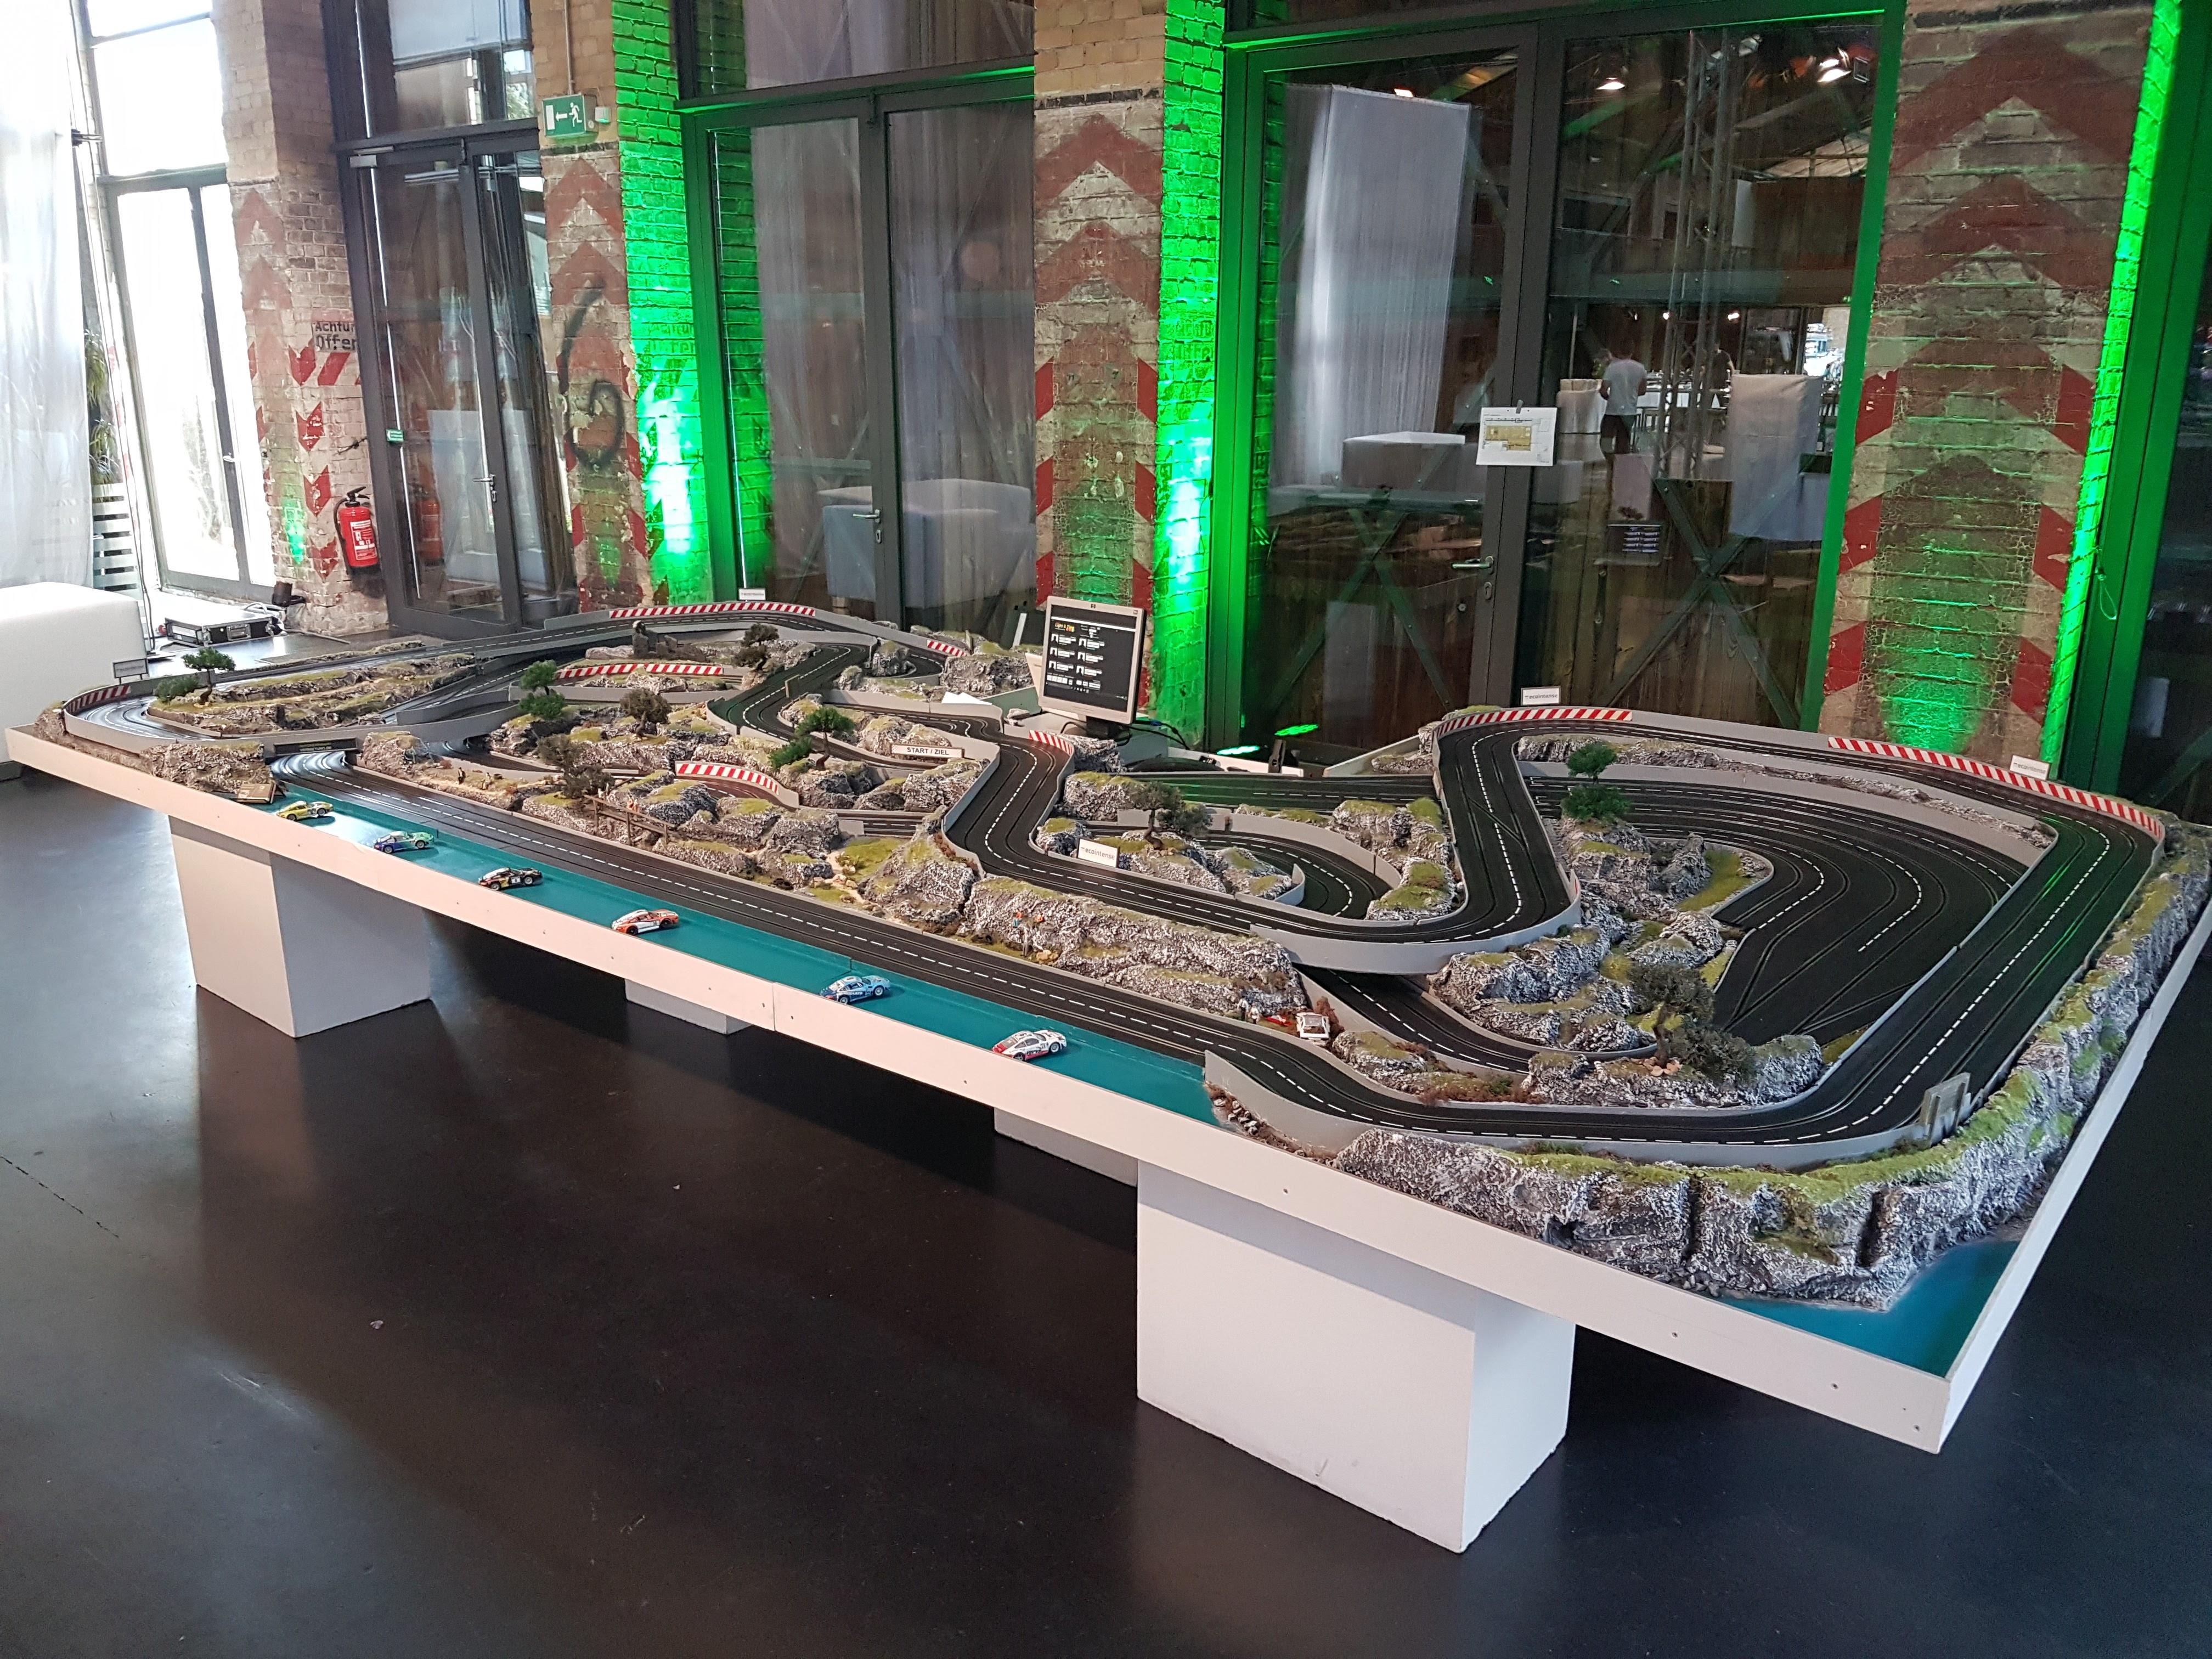 Carrerabahn XXL